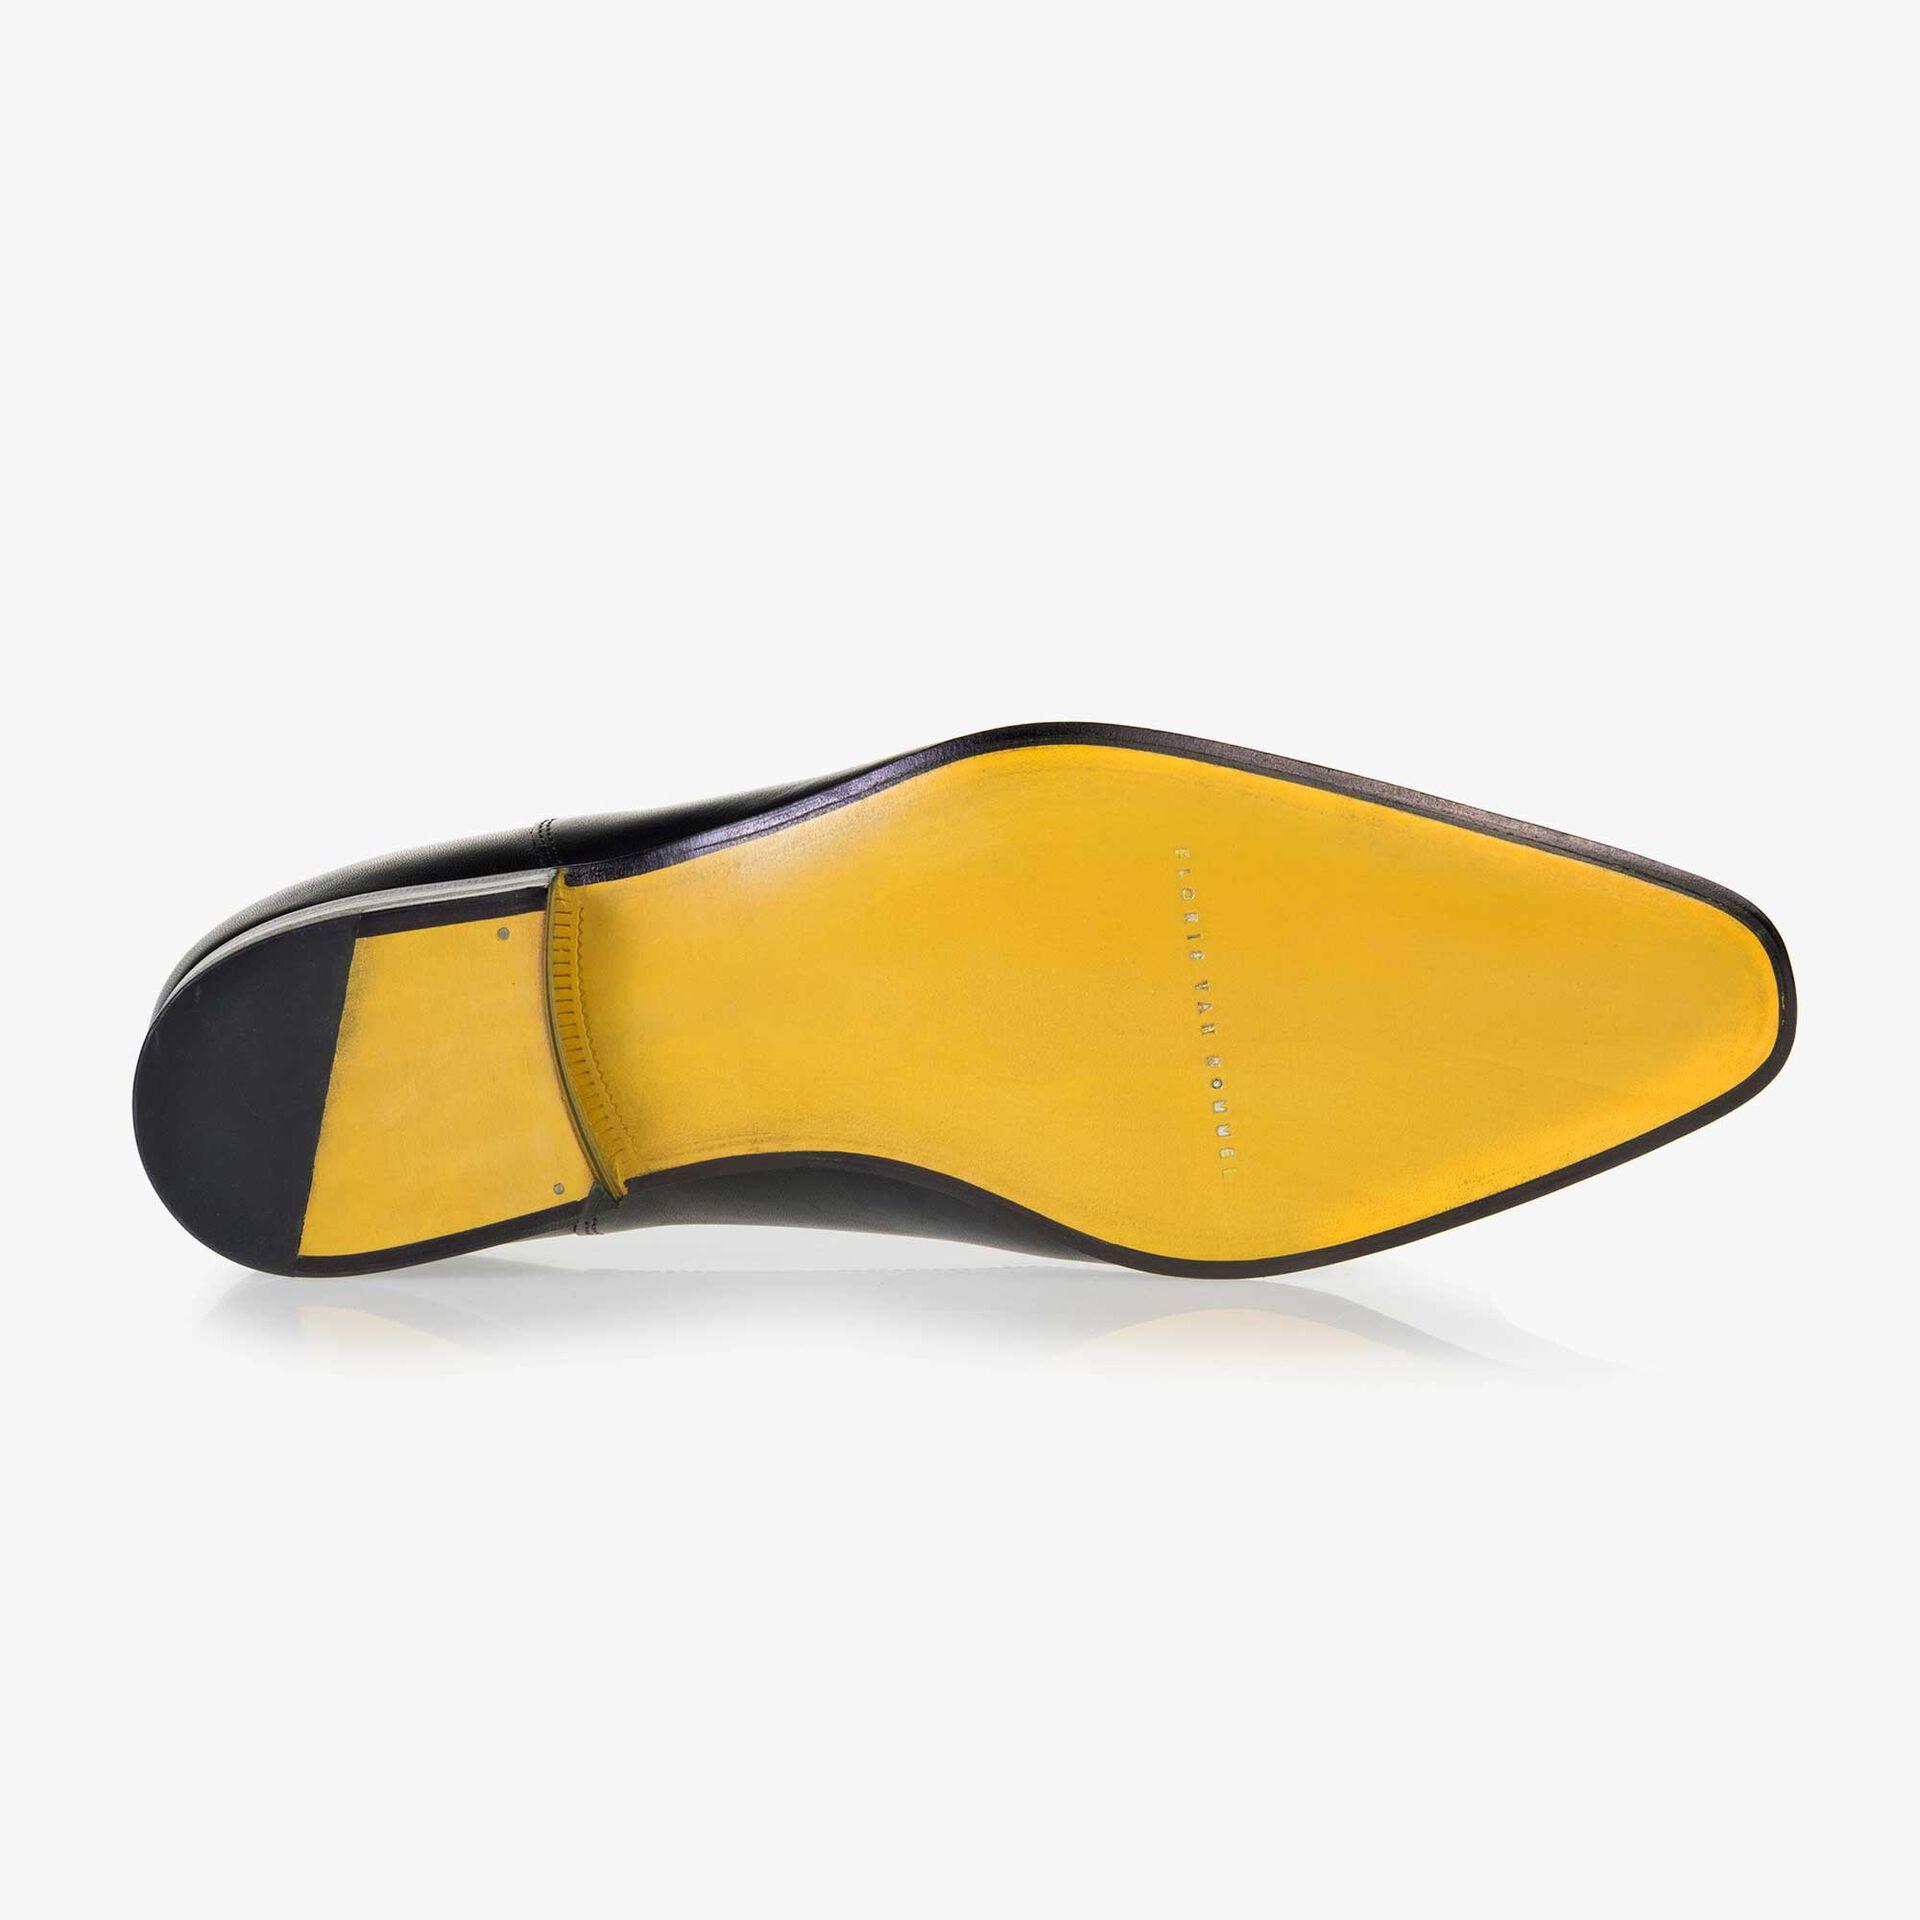 Black calf's leather lace shoe